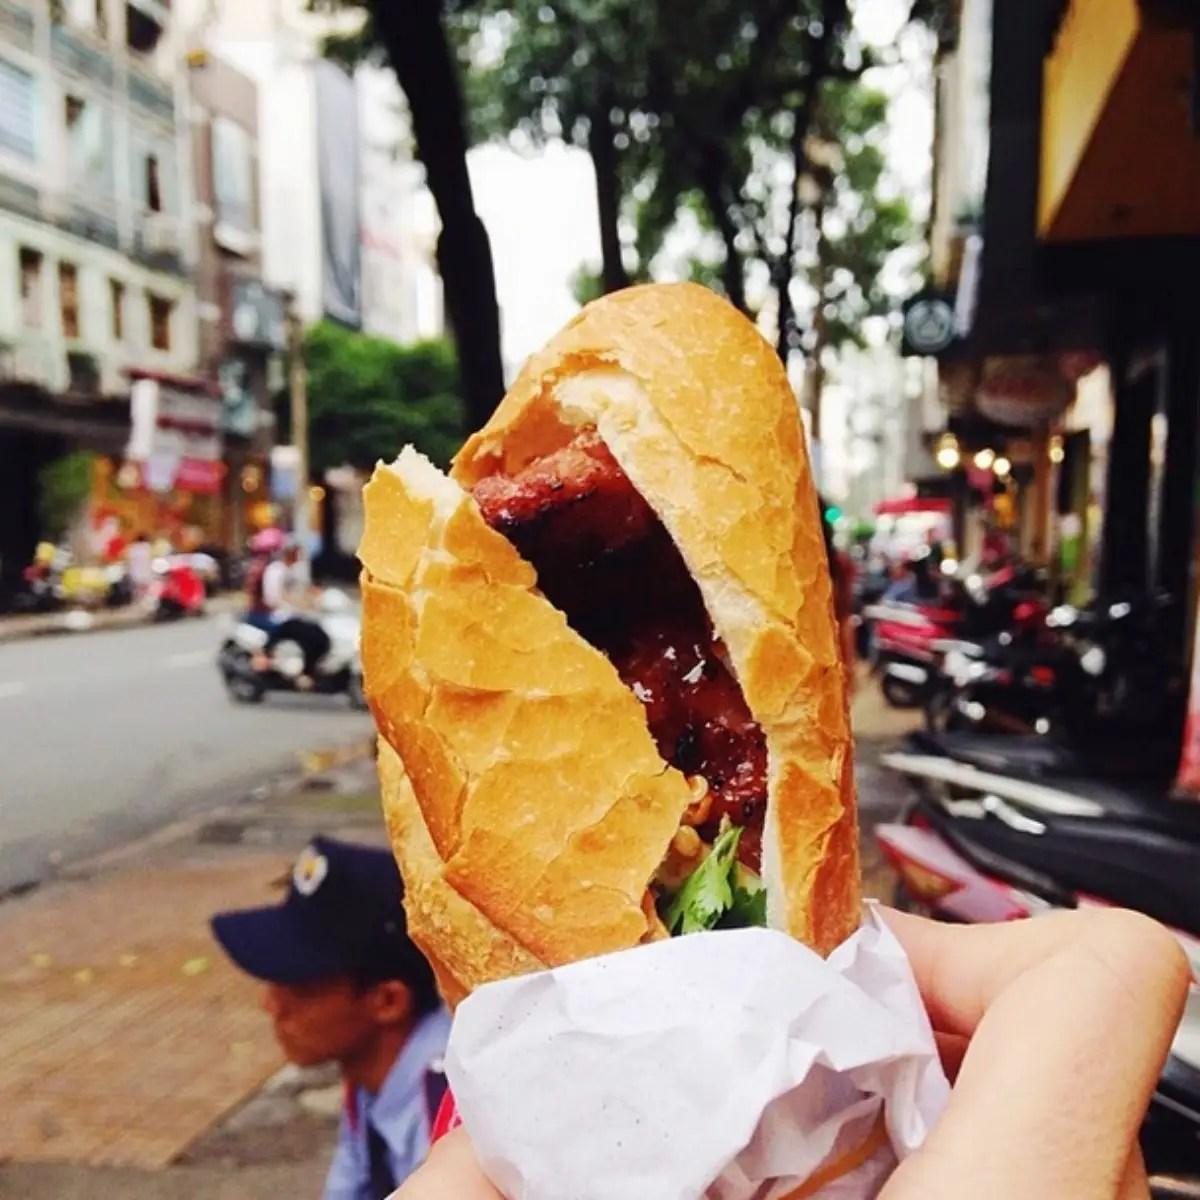 Bánh mì in Saigon, Vietnam. Bánh mì is a Vietnamese baguette, reminiscent of French colonial times.